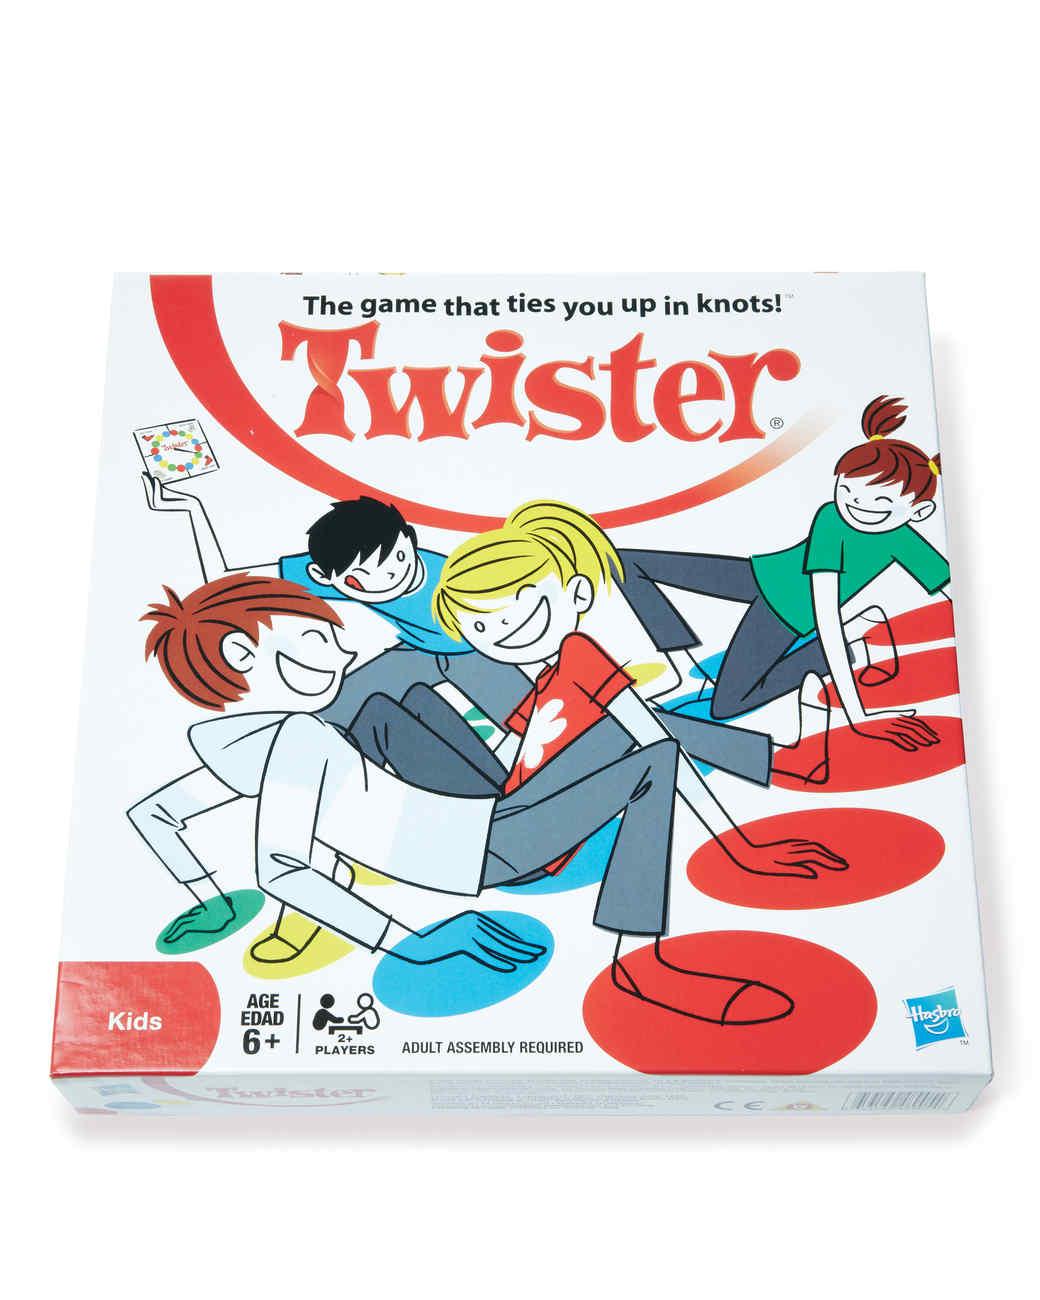 games-twister-0811mld107420.jpg